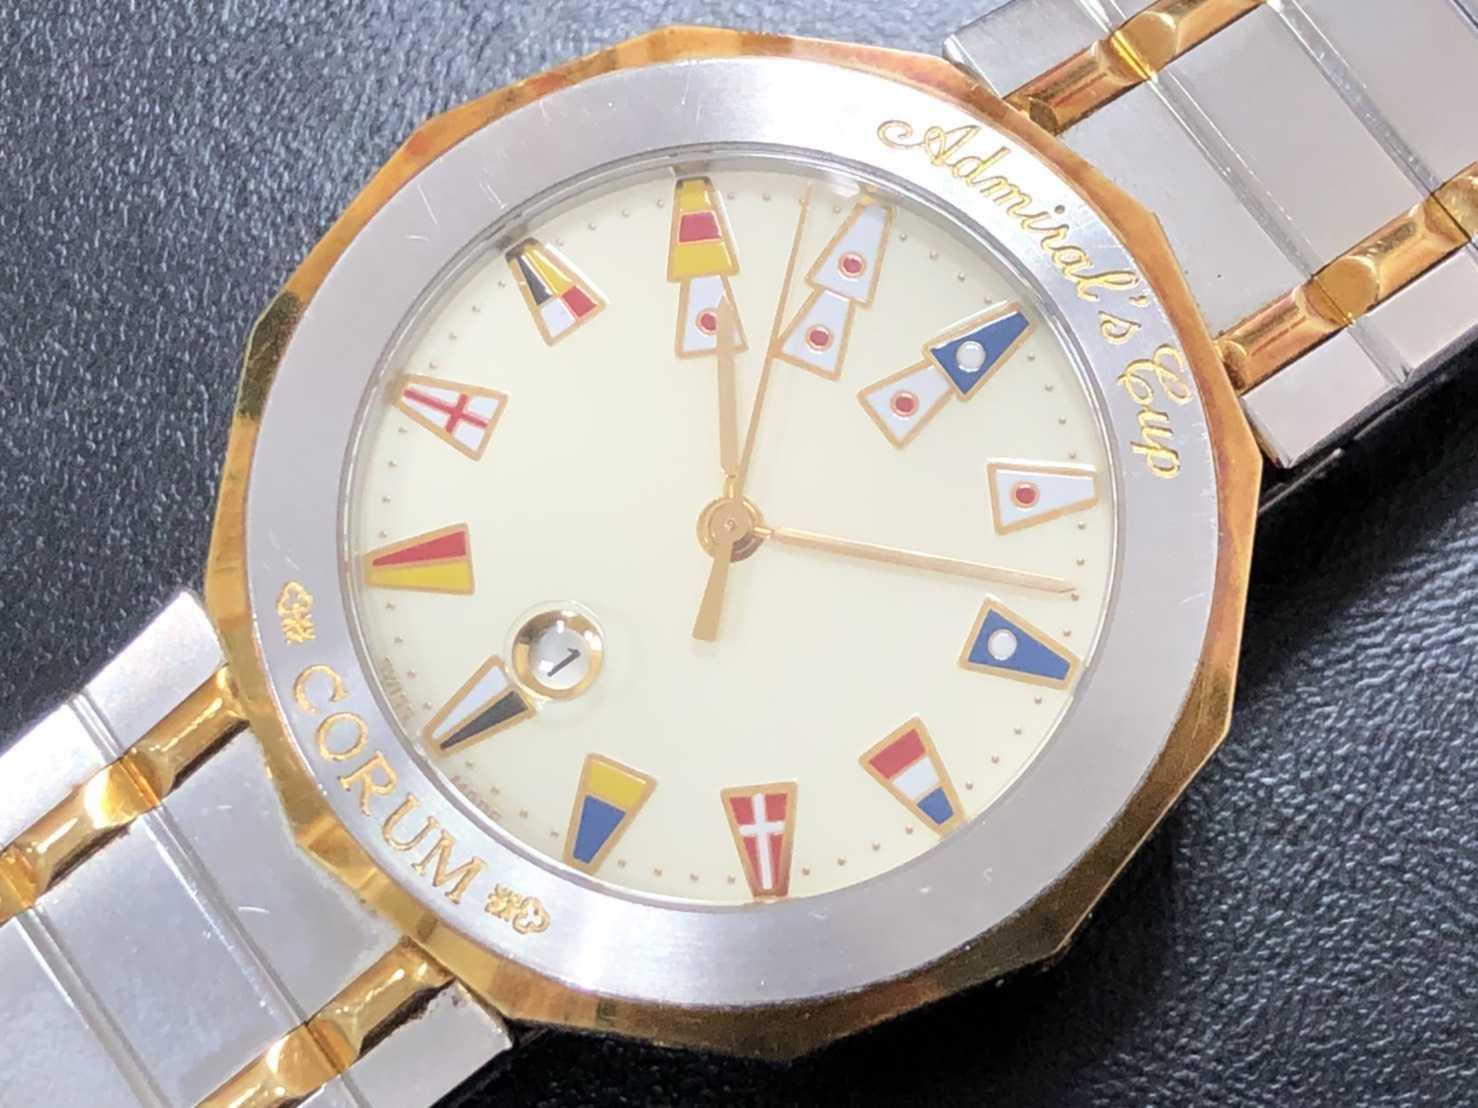 sale retailer f12f2 09e8a コルム買取 腕時計のマルカ(MARUKA)買取価格速報 87204